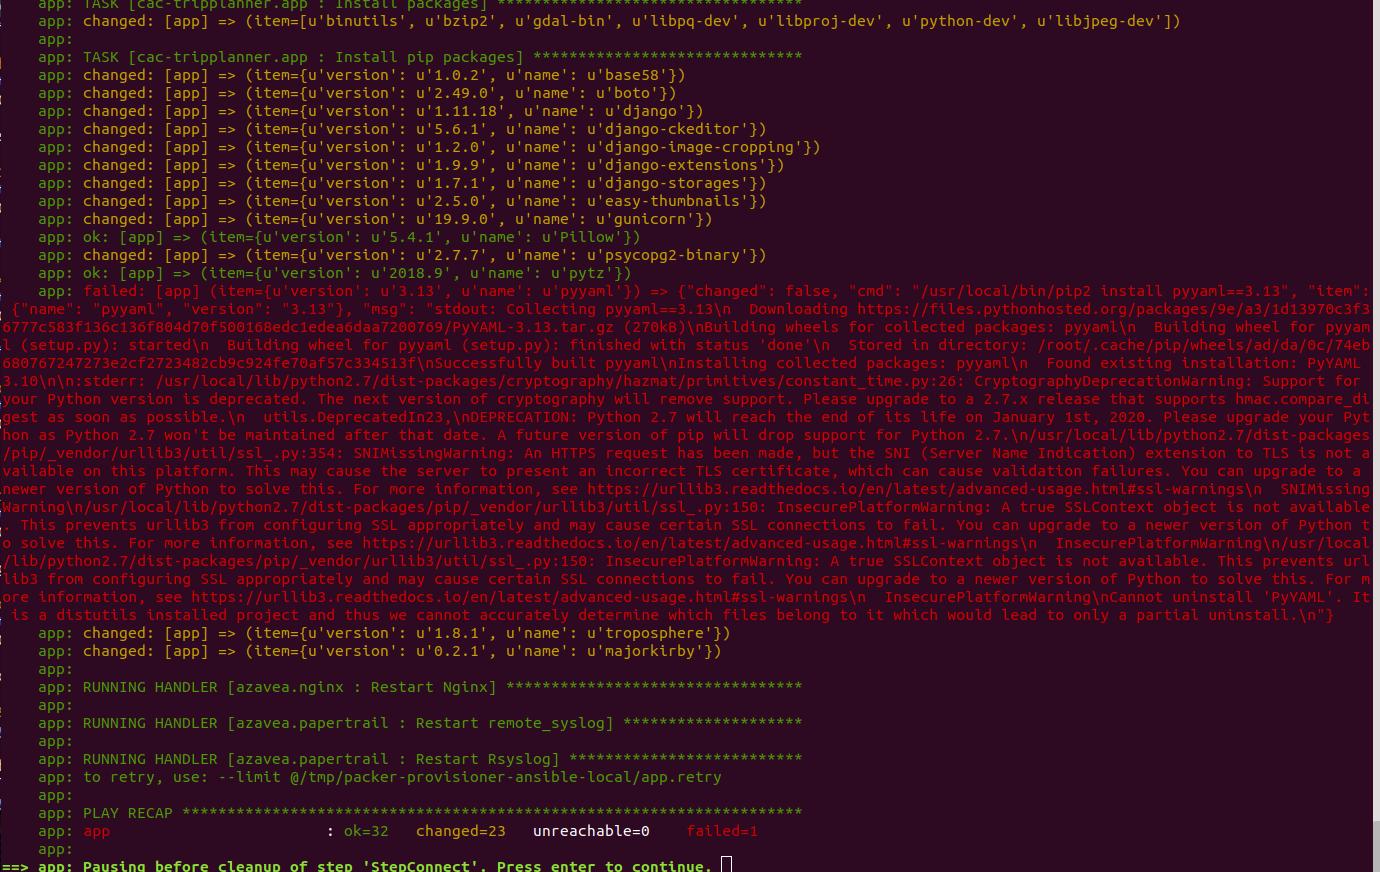 Fix AMI build error when installing Python dependencies